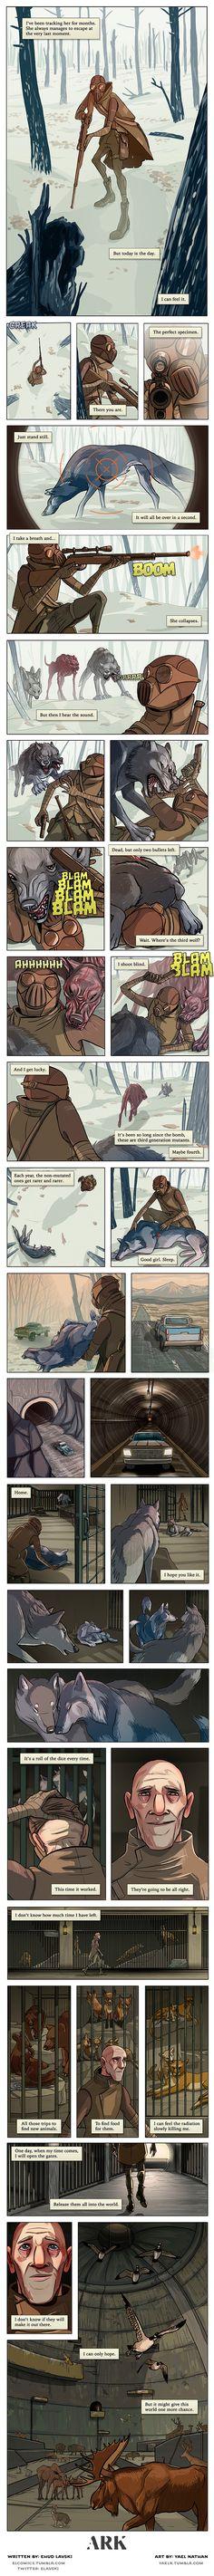 My Favorite Short Graphic Novel. - Imgur